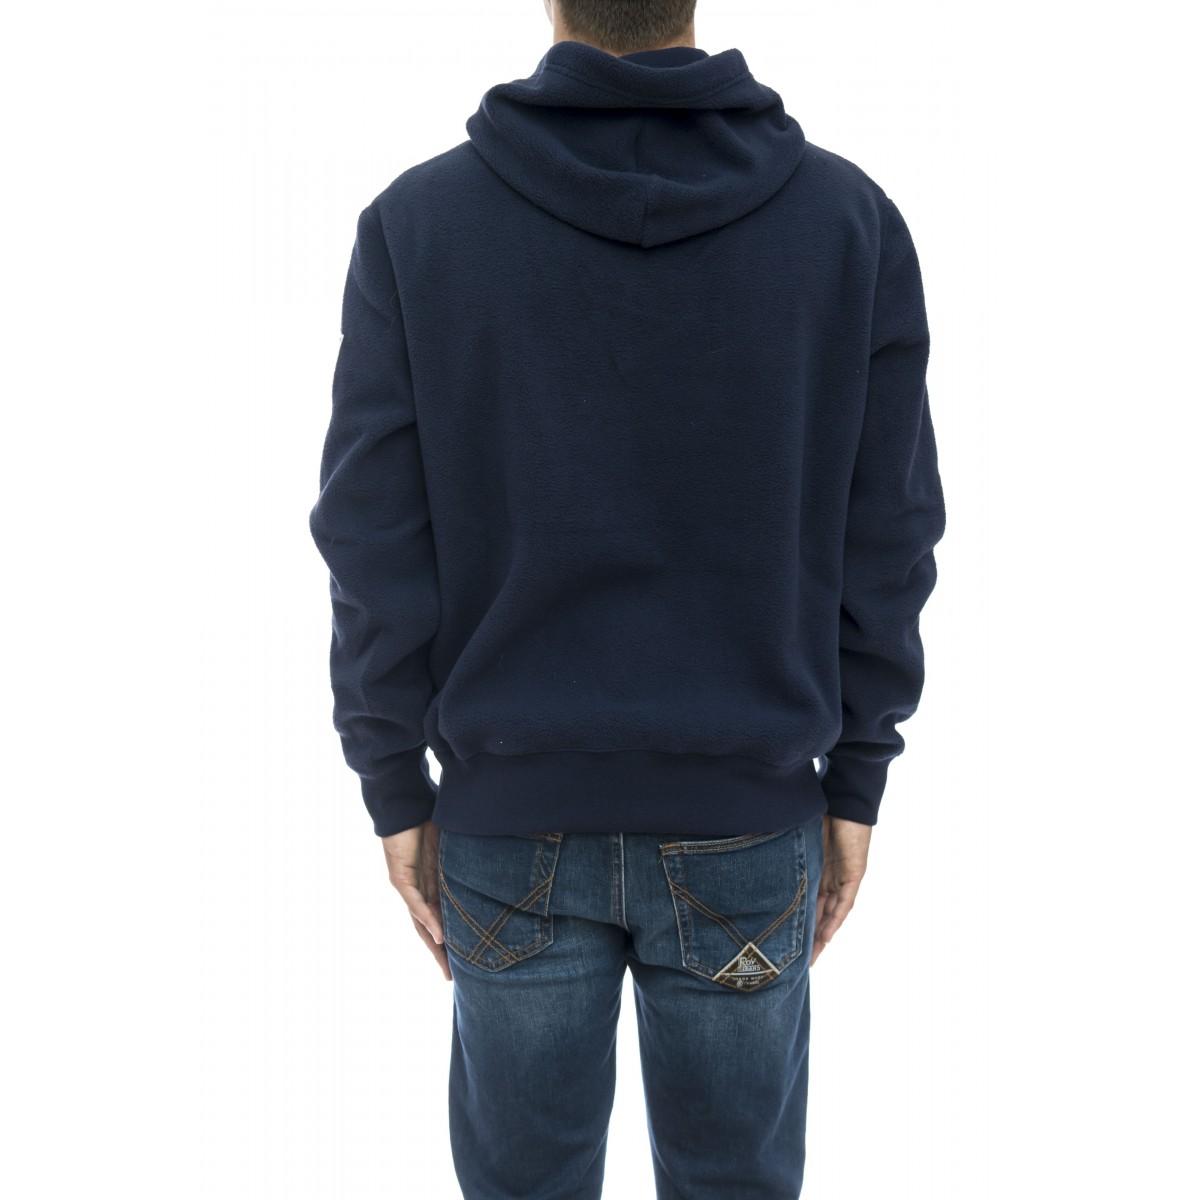 Felpa uomo - 696327 pile con cappuccio logo